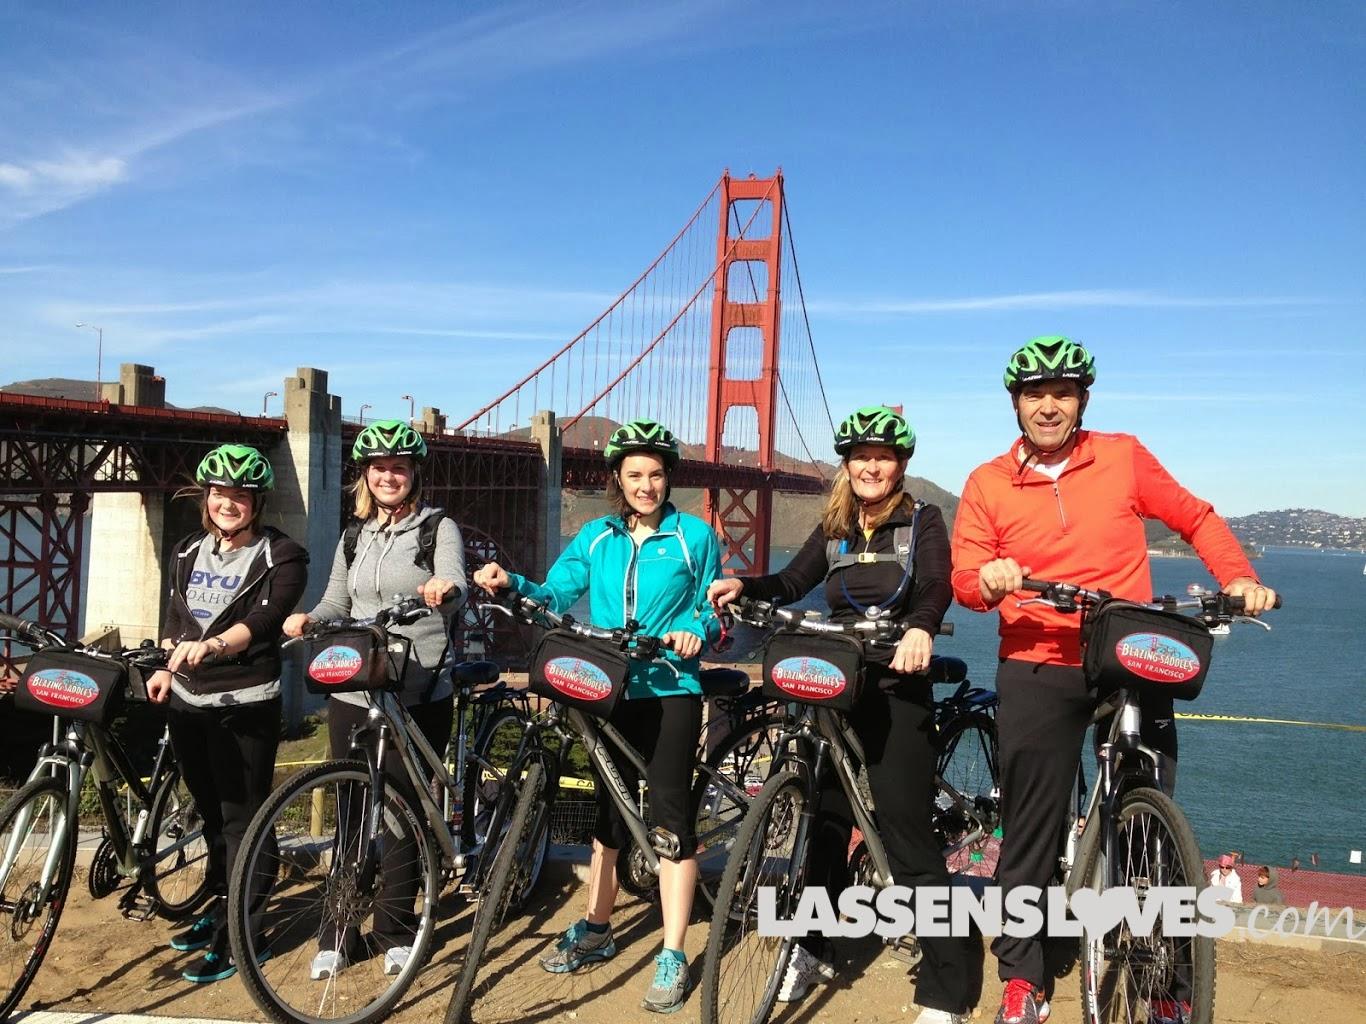 fancy+foods+show, San+Francisco, Golden+Gate+Bridge